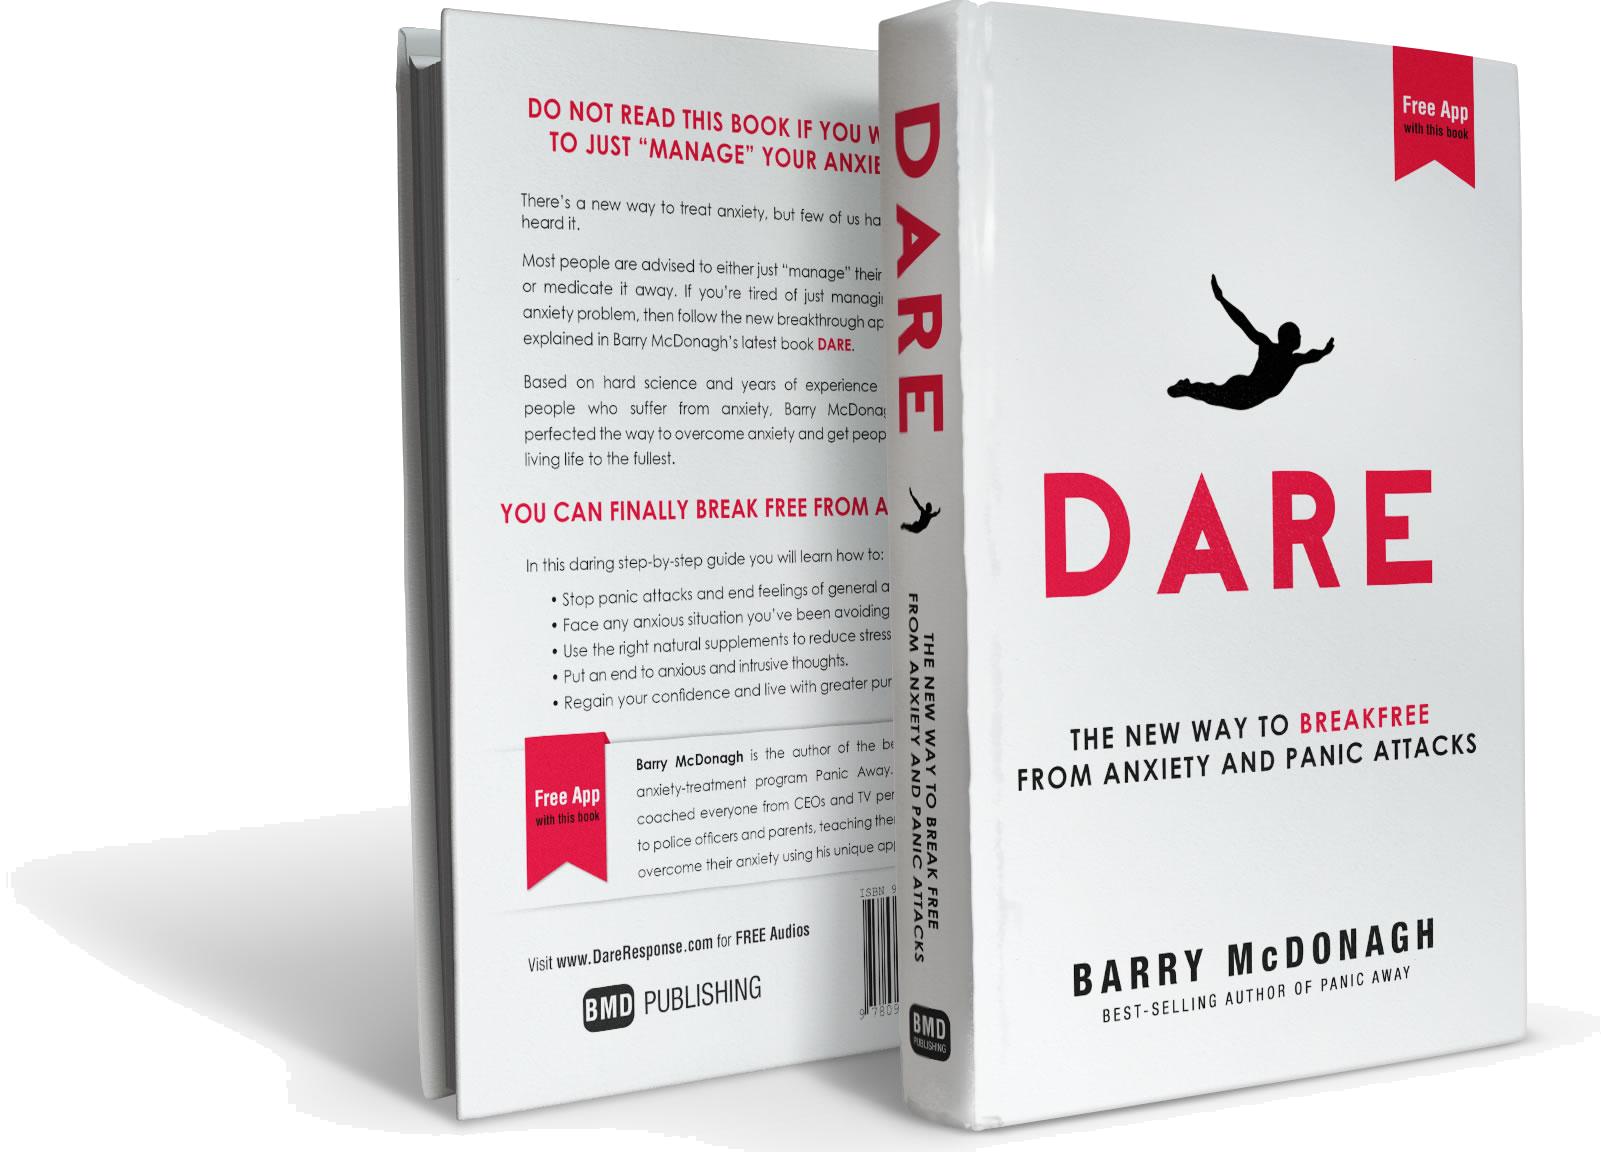 darebook